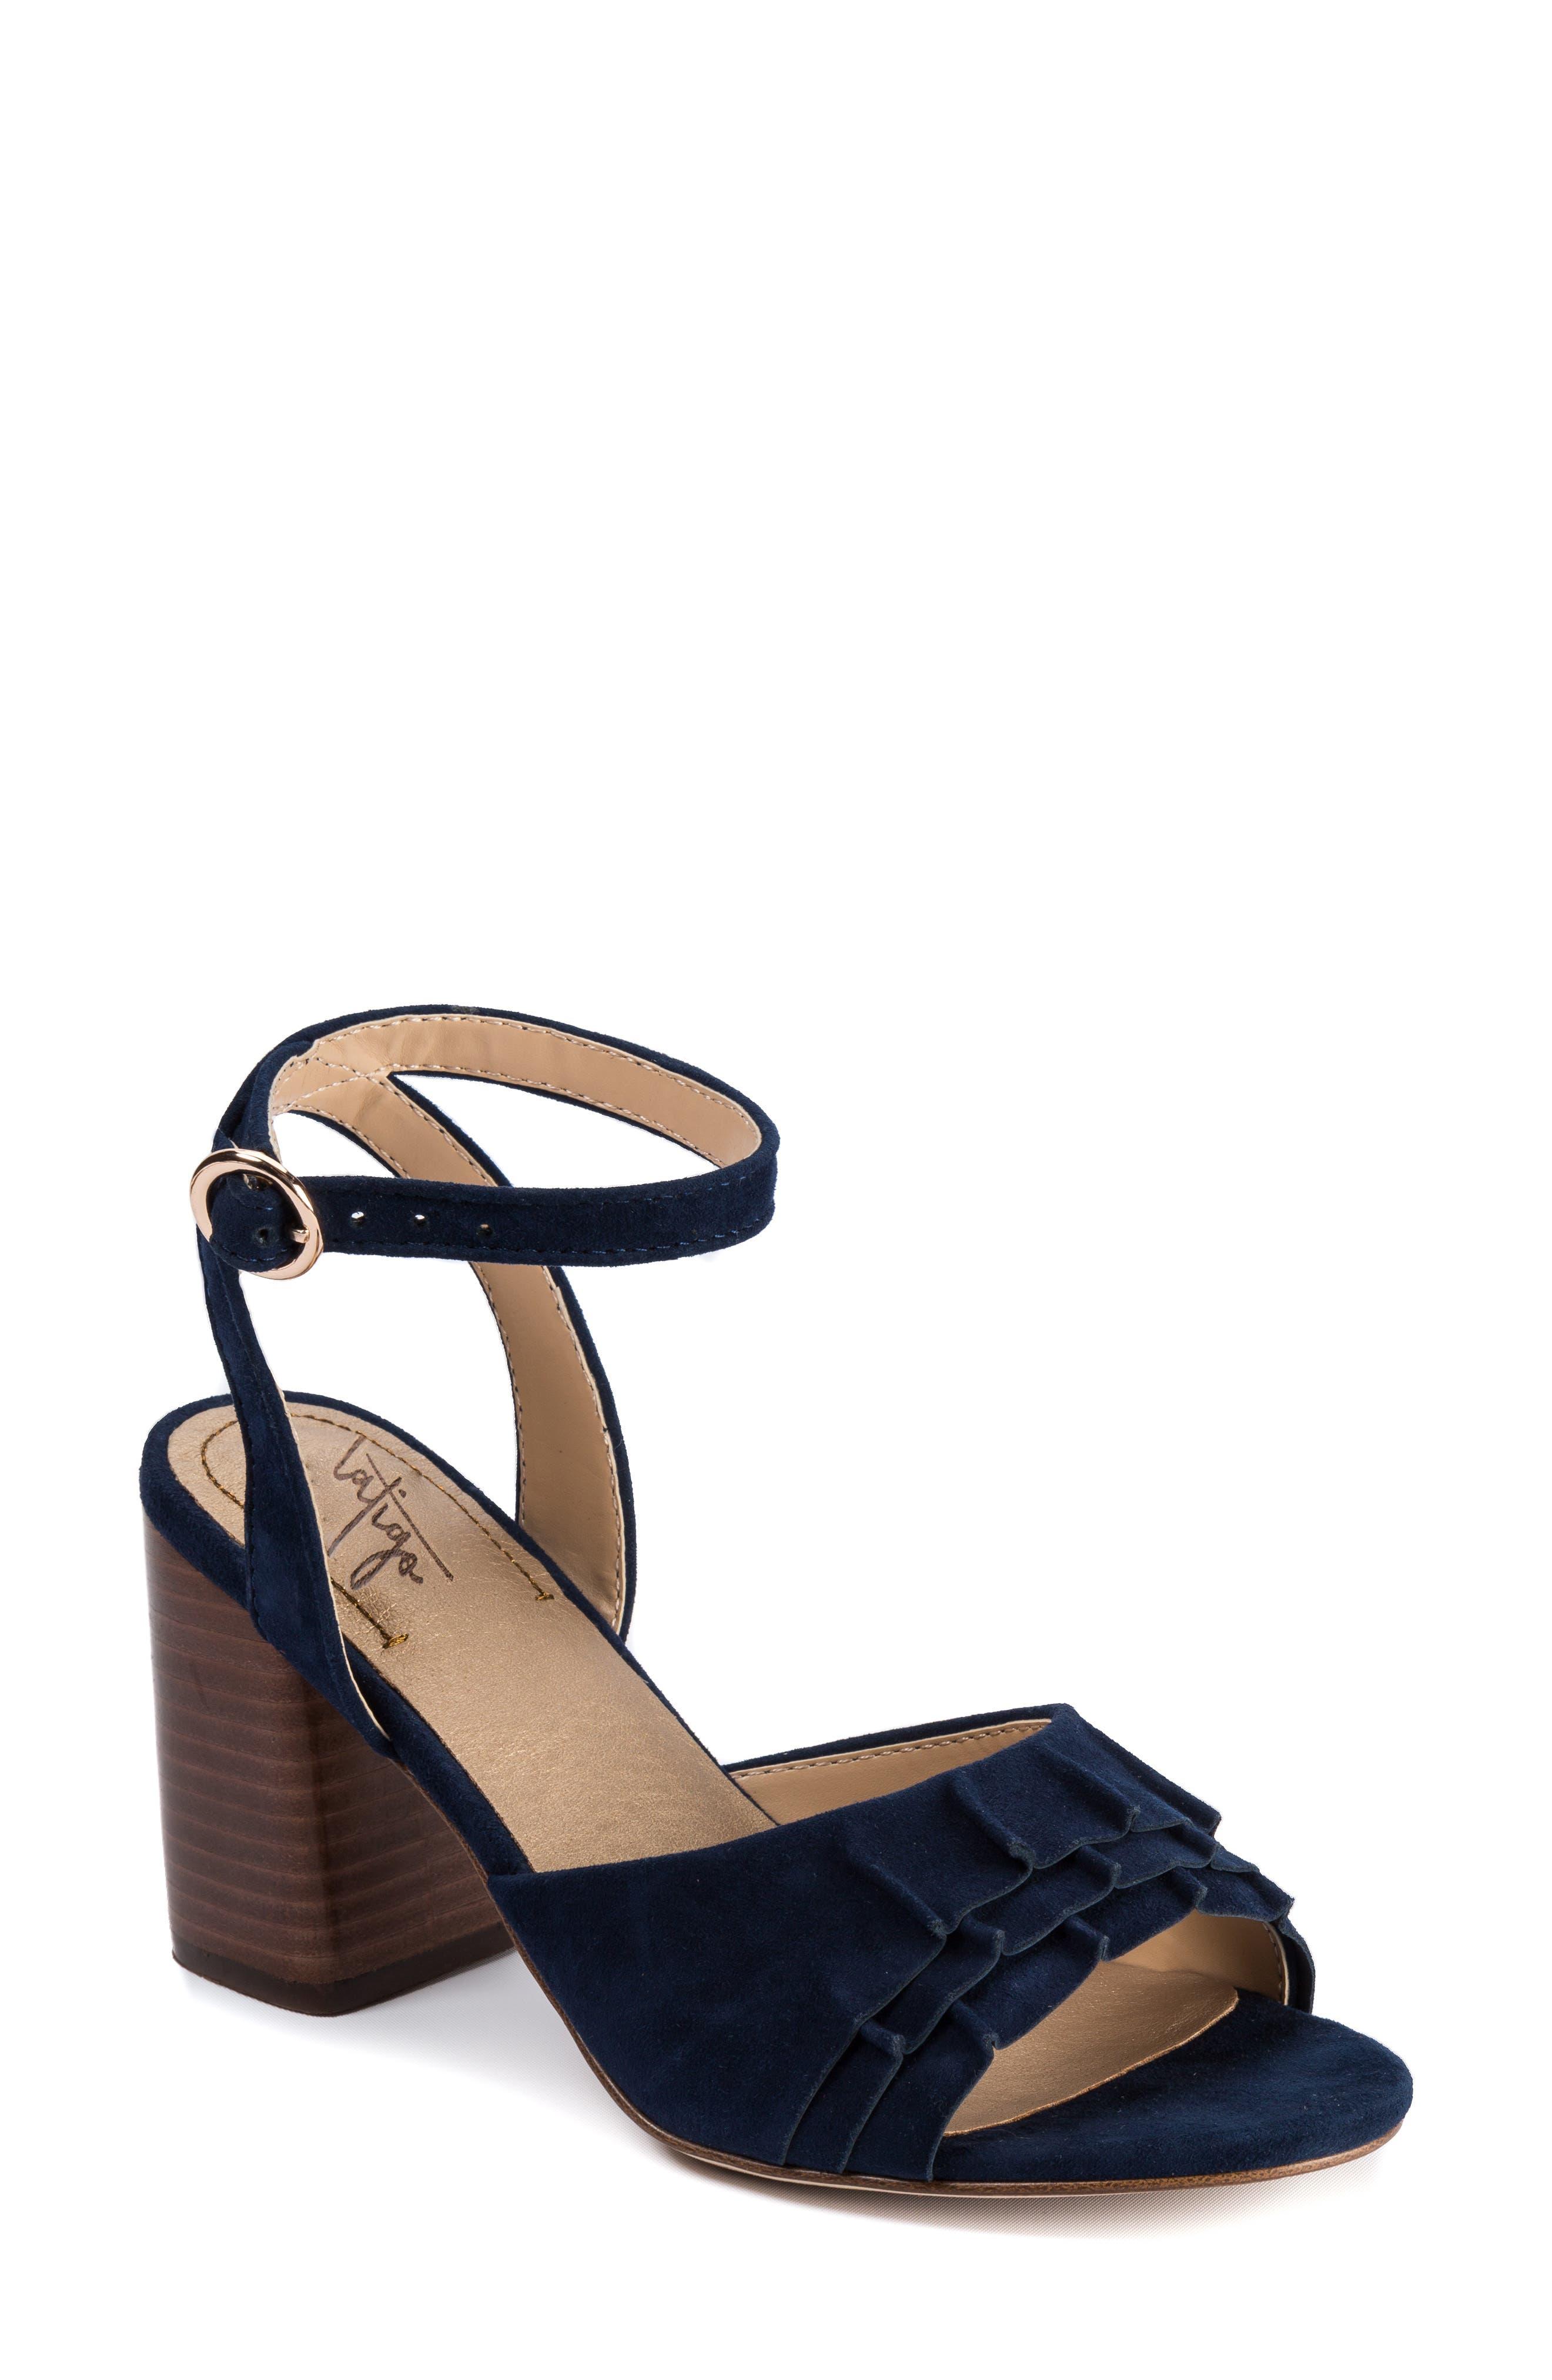 LATIGO Idelle Ankle Strap Sandal, Main, color, 410